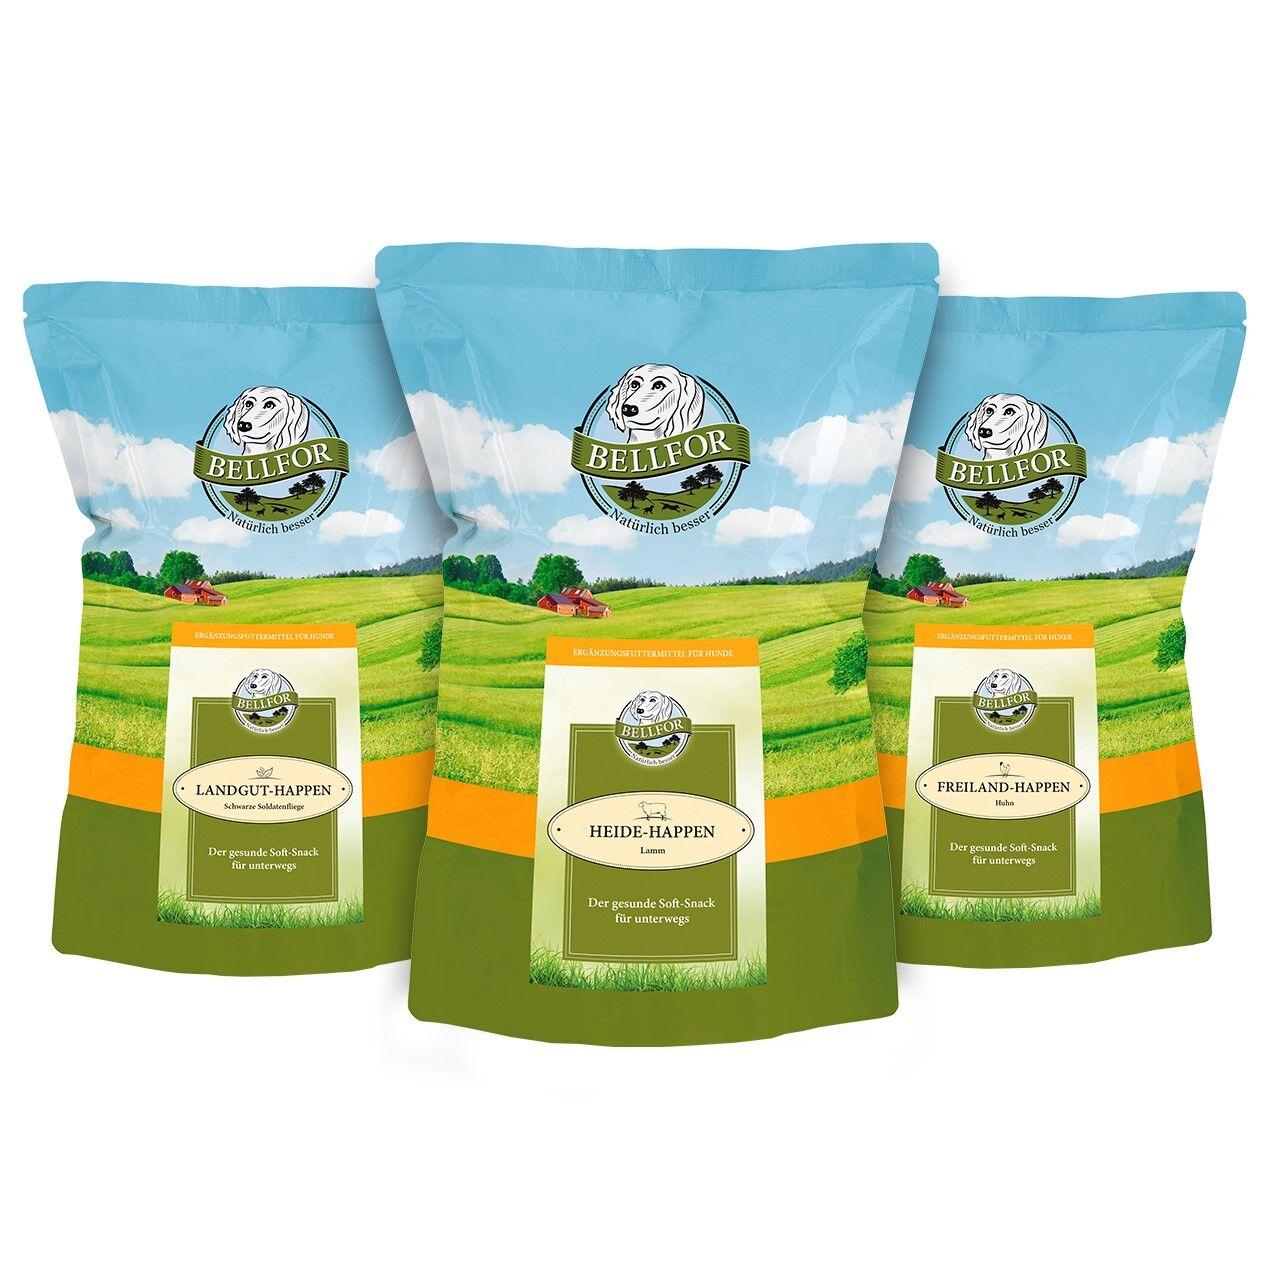 Bellfor Hundefutter Mix 3 Soft-snacks - Freiland-Happen 200g + Heide-Happen 200g + Landgut-Happen 200g